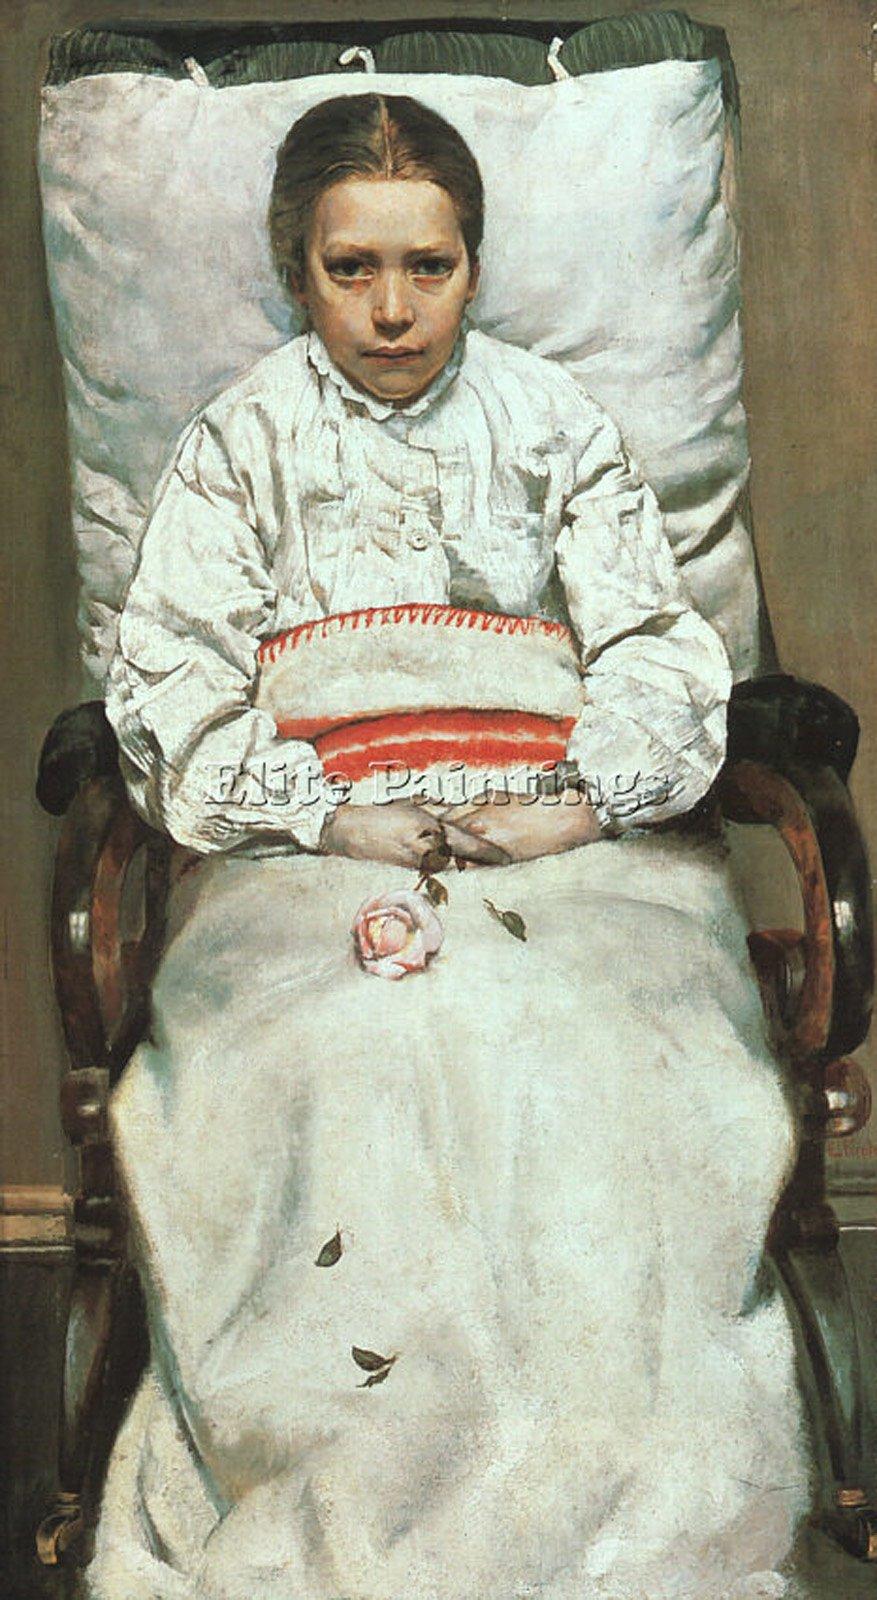 KROHG CHRISTIAN NORWEIGAN 1852 1925 ARTIST PAINTING OIL CANVAS REPRO ART DECO 24x12inch